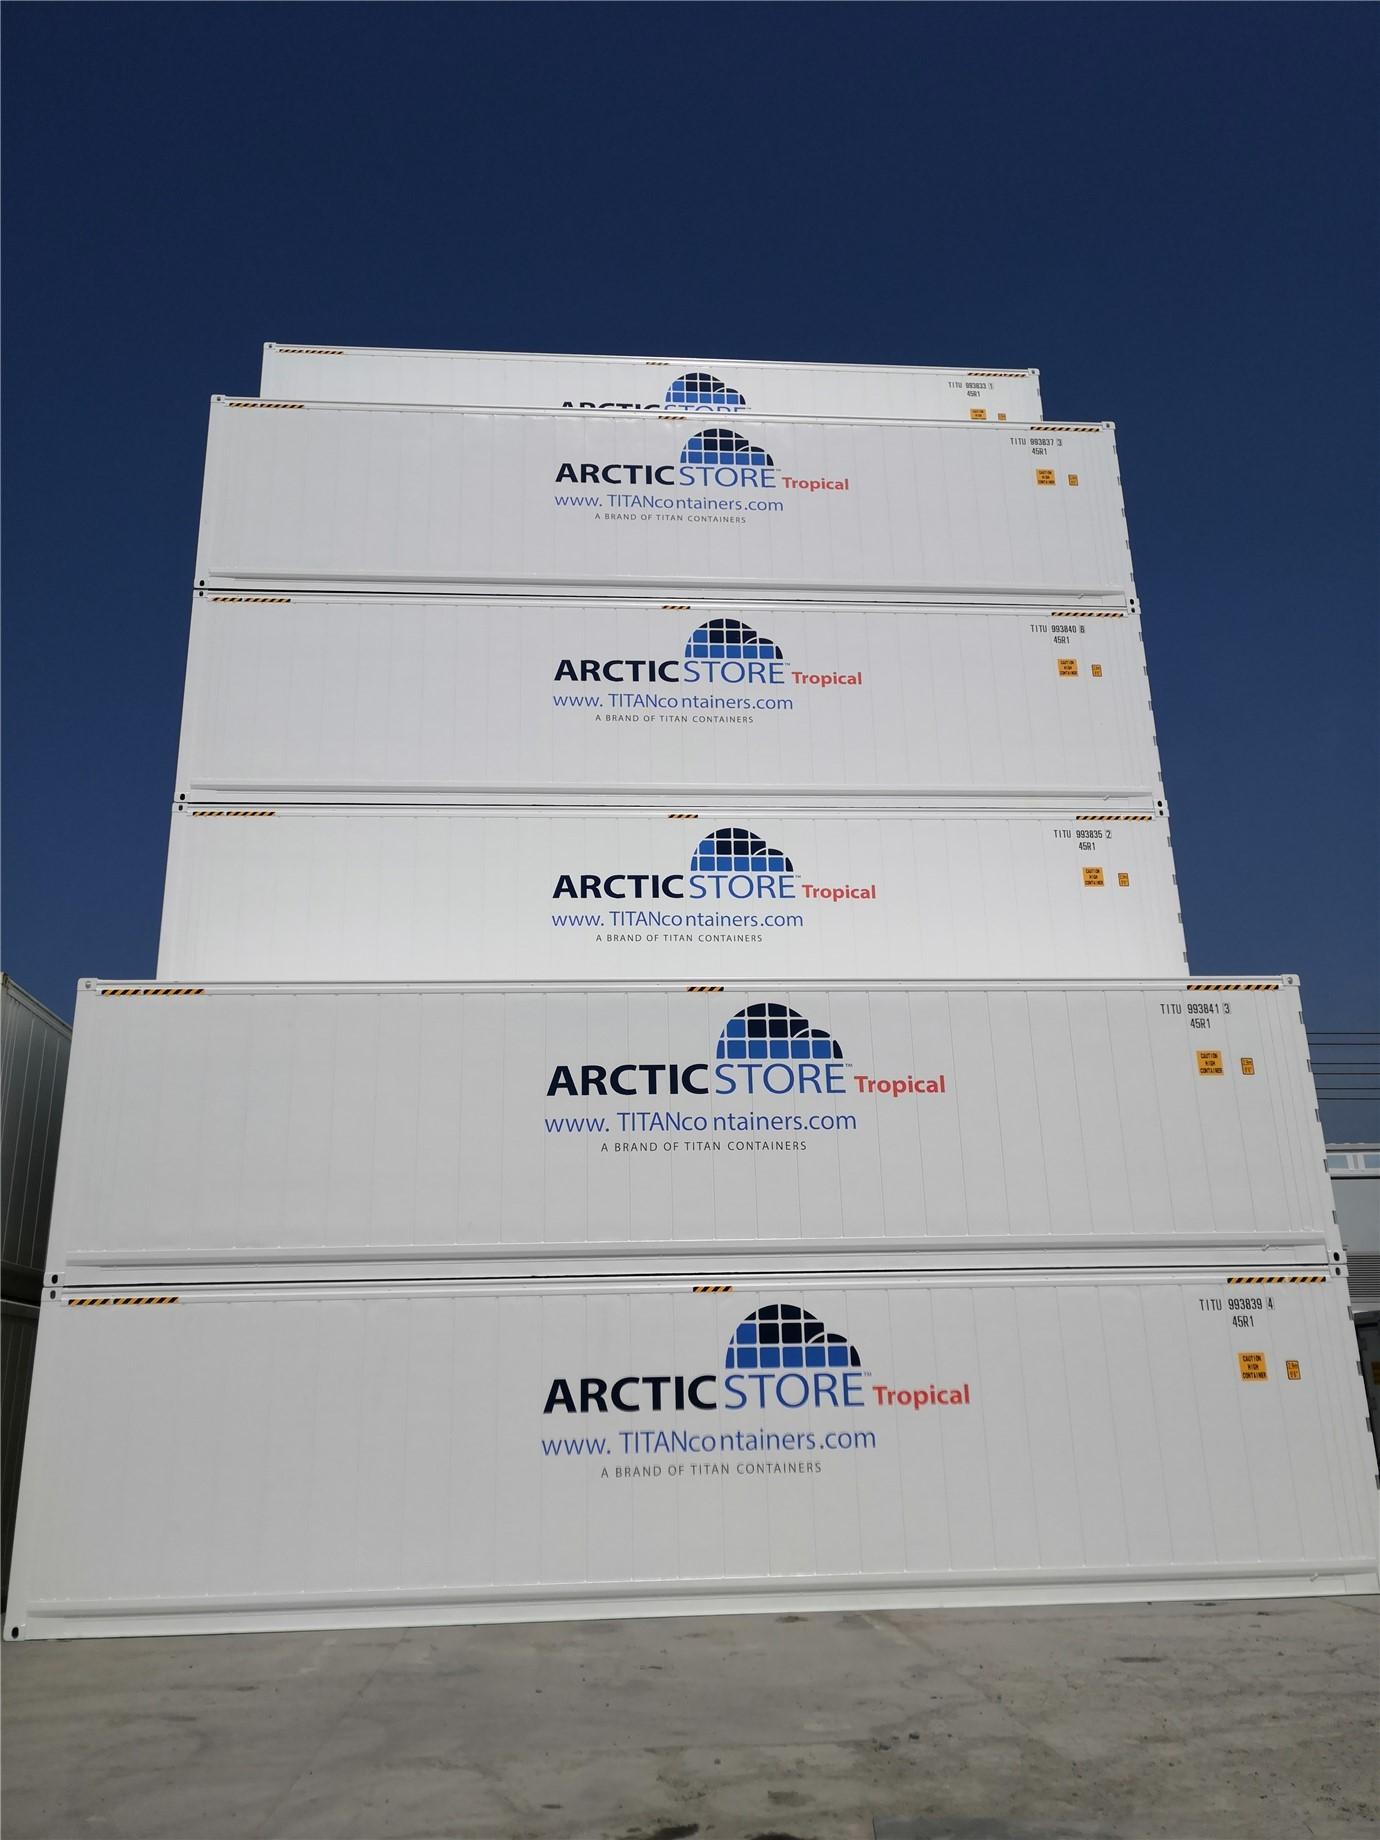 Arcticstore Tropical 40' (12 m) soğutmalı konteyner modelimiz